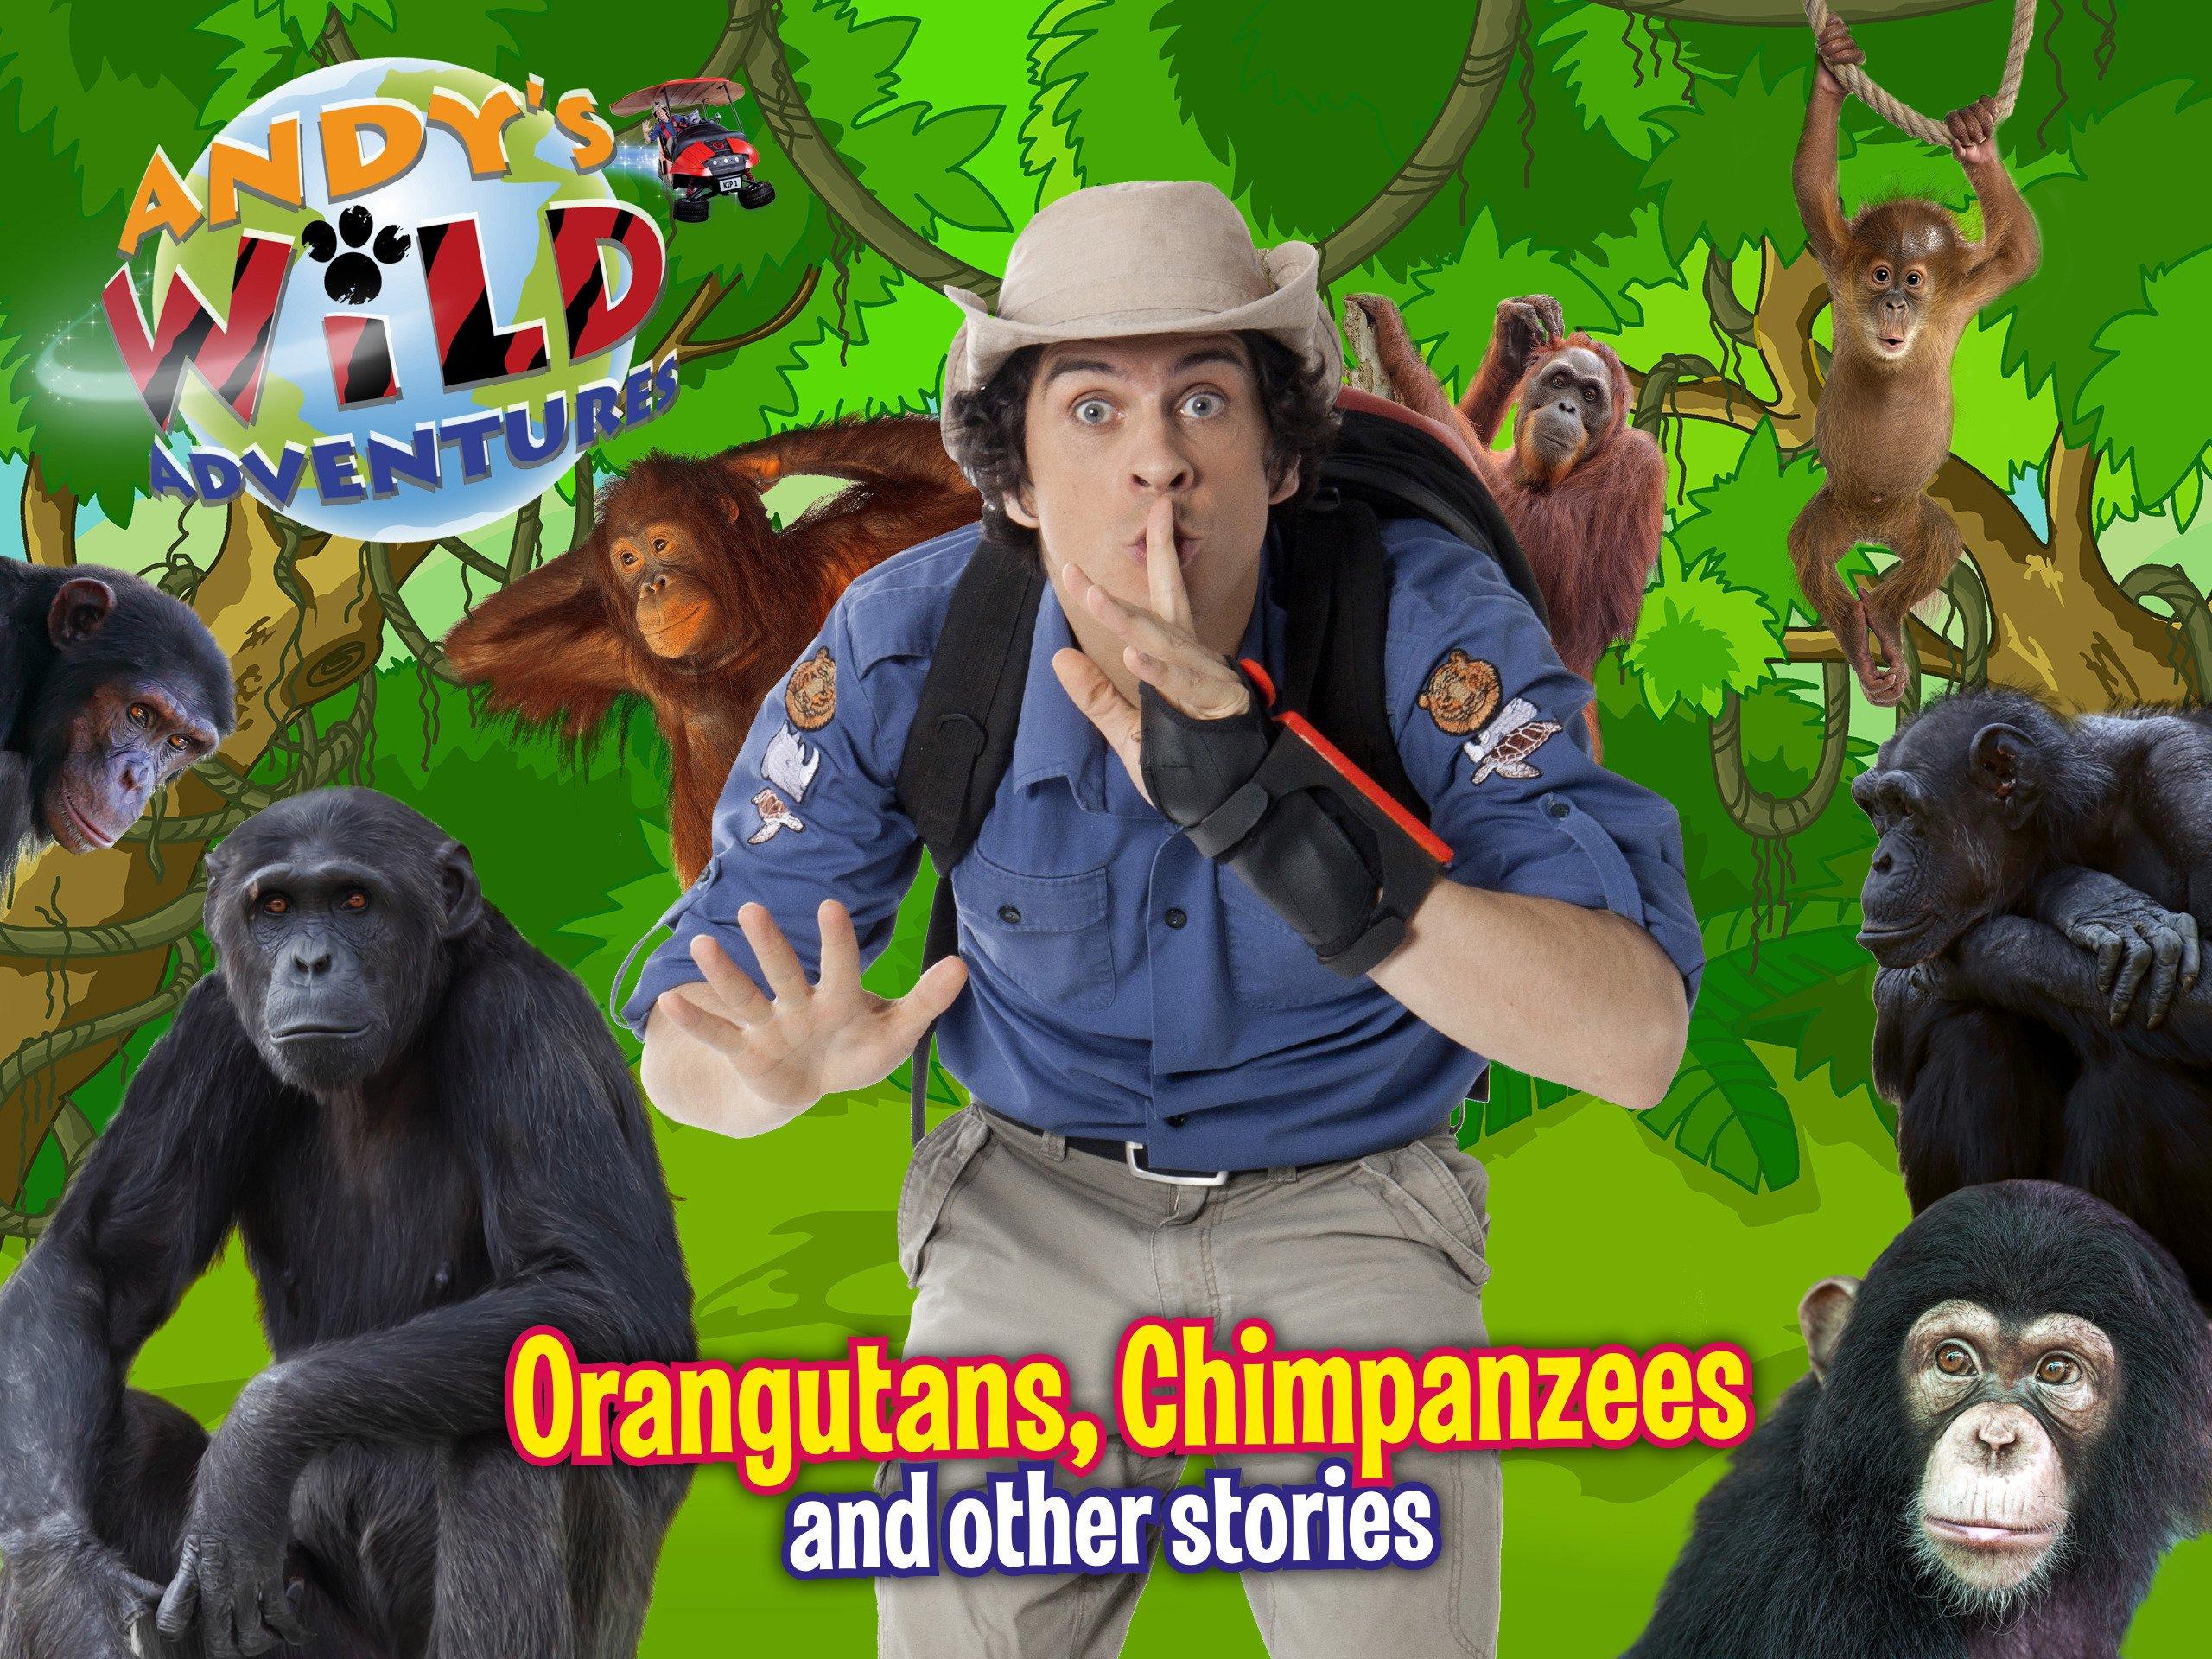 安迪野生历险Andy's Wild Adventures